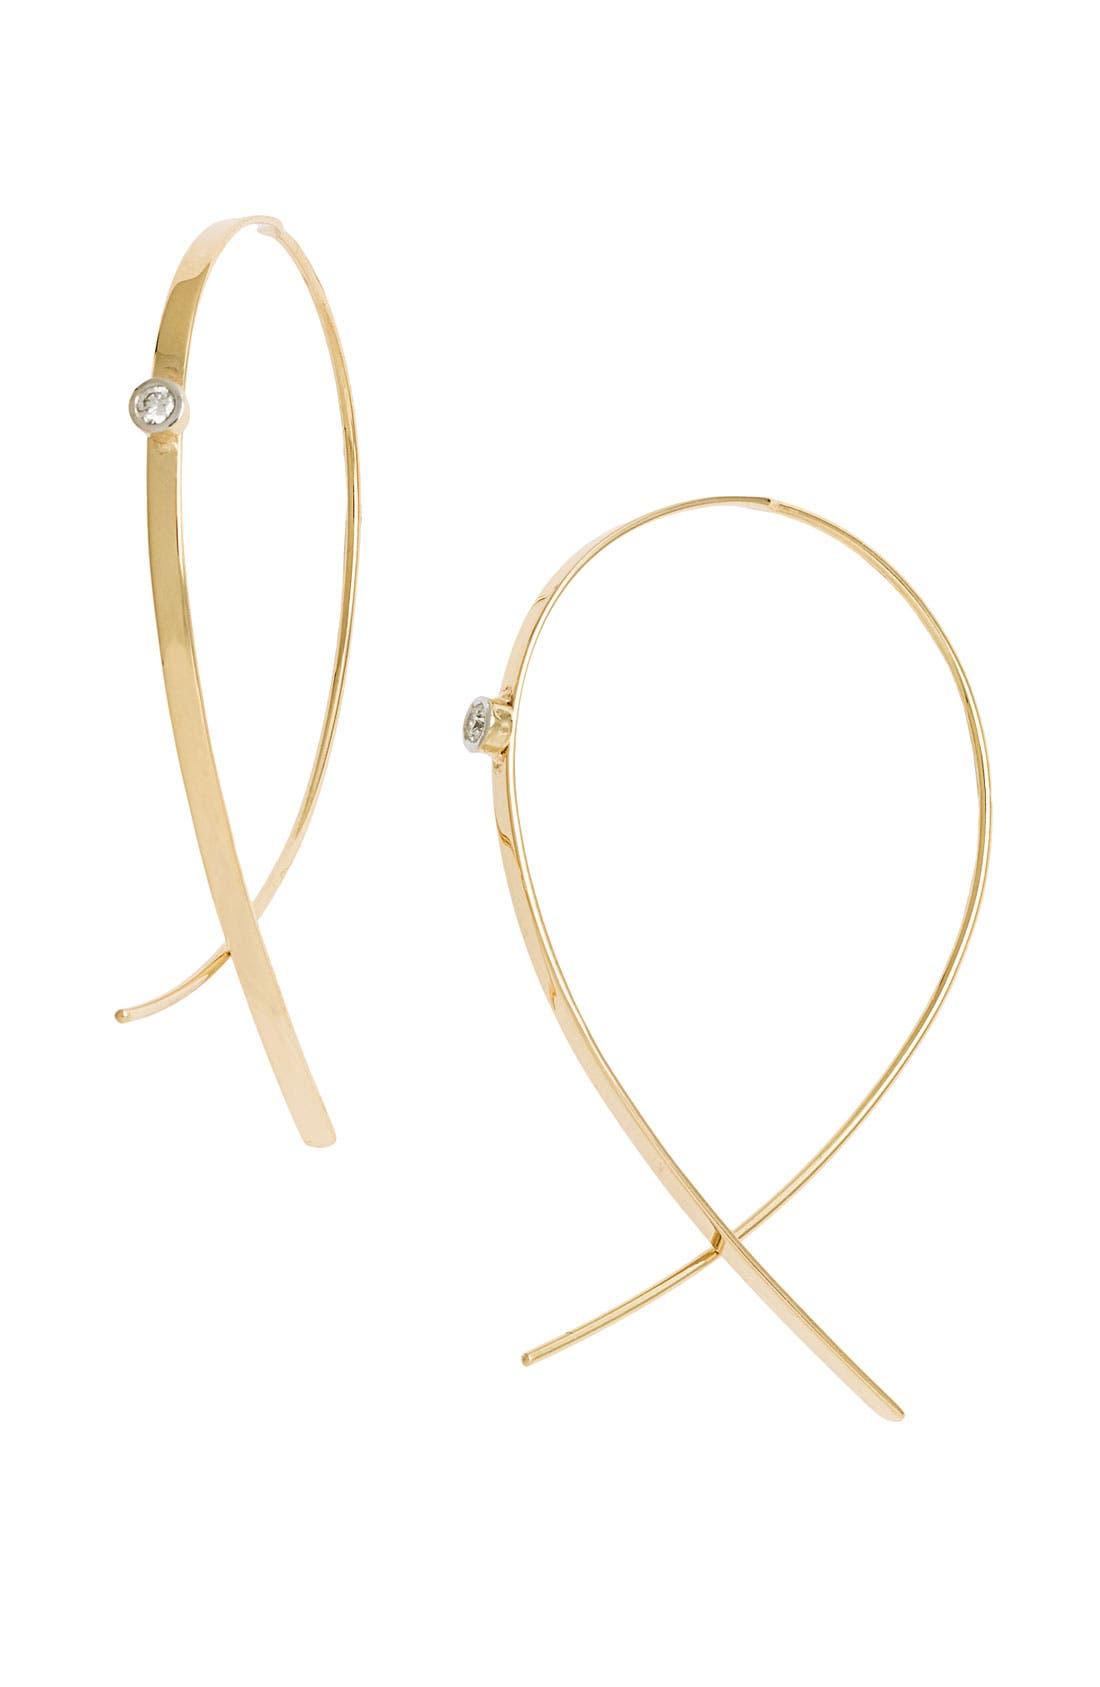 Main Image - Lana Jewelry 'Small Upside Down' Diamond Hoop Earrings